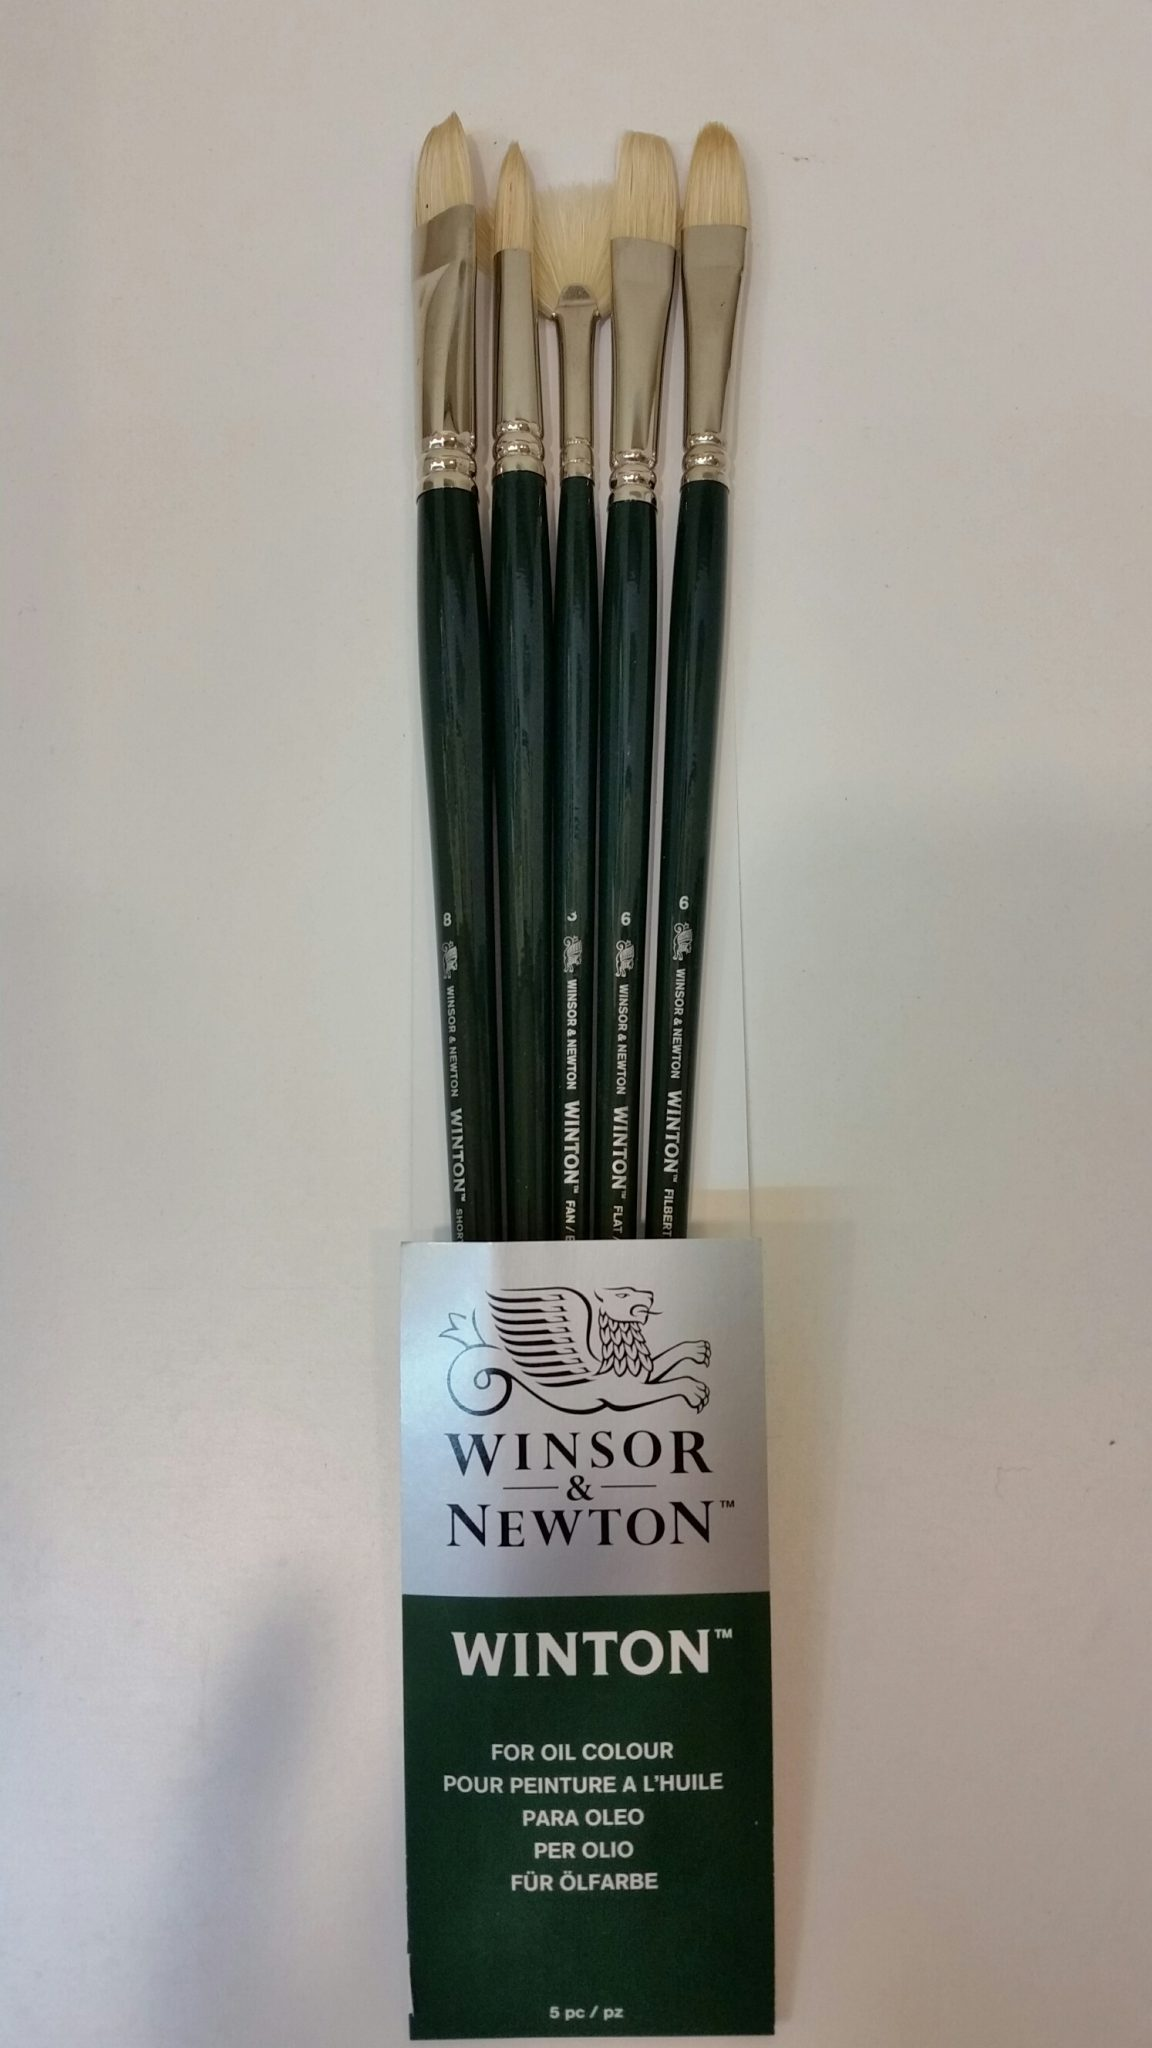 Brush Set – Winsor & Newton Winton Oil Brush Set